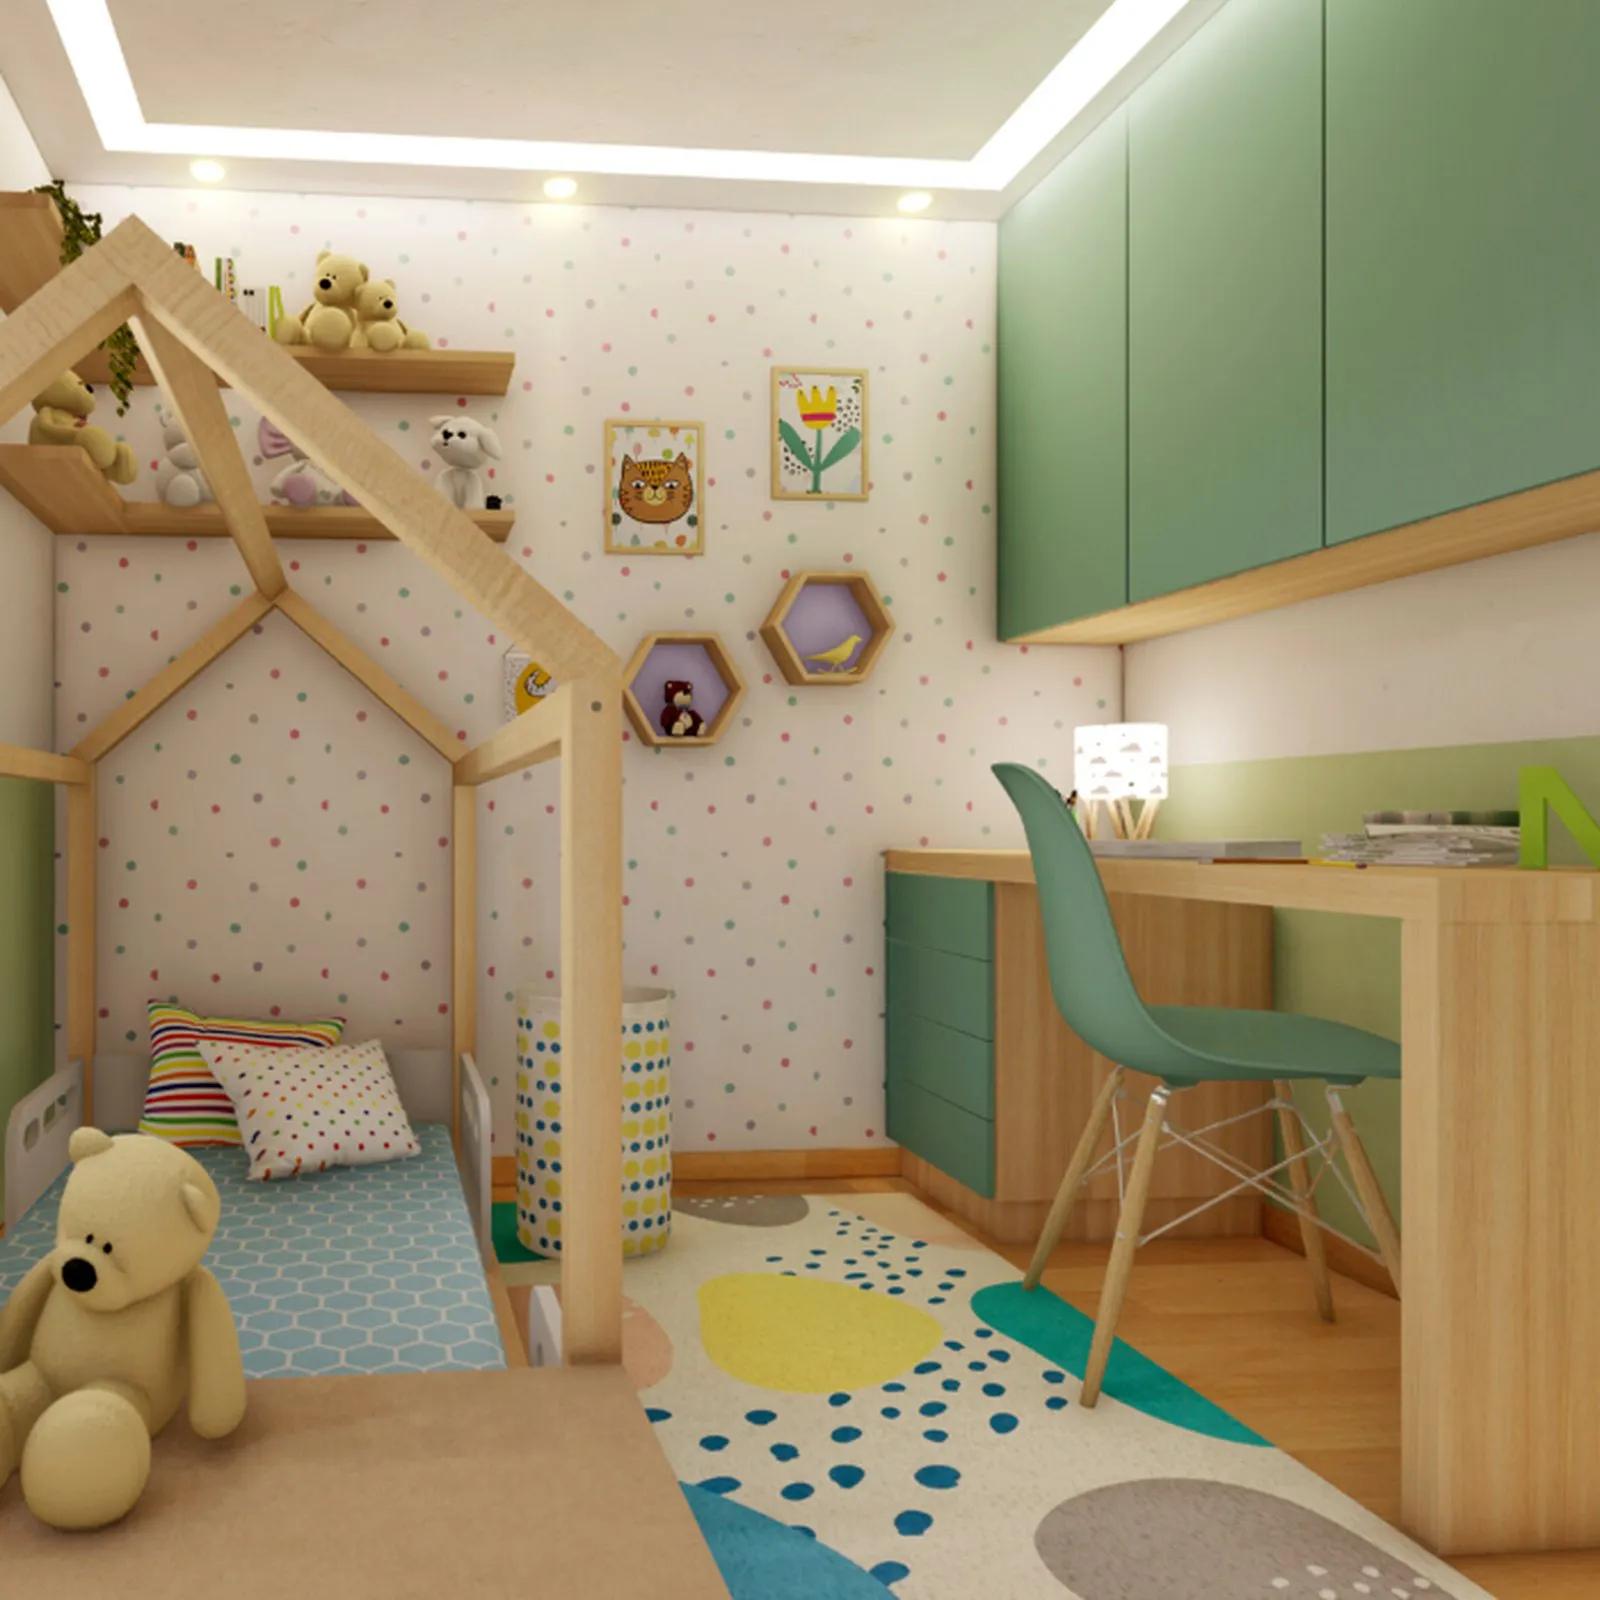 Tapete quarto infantil 100 x 150 cm estampa Mergulho  - Pomelo Decor